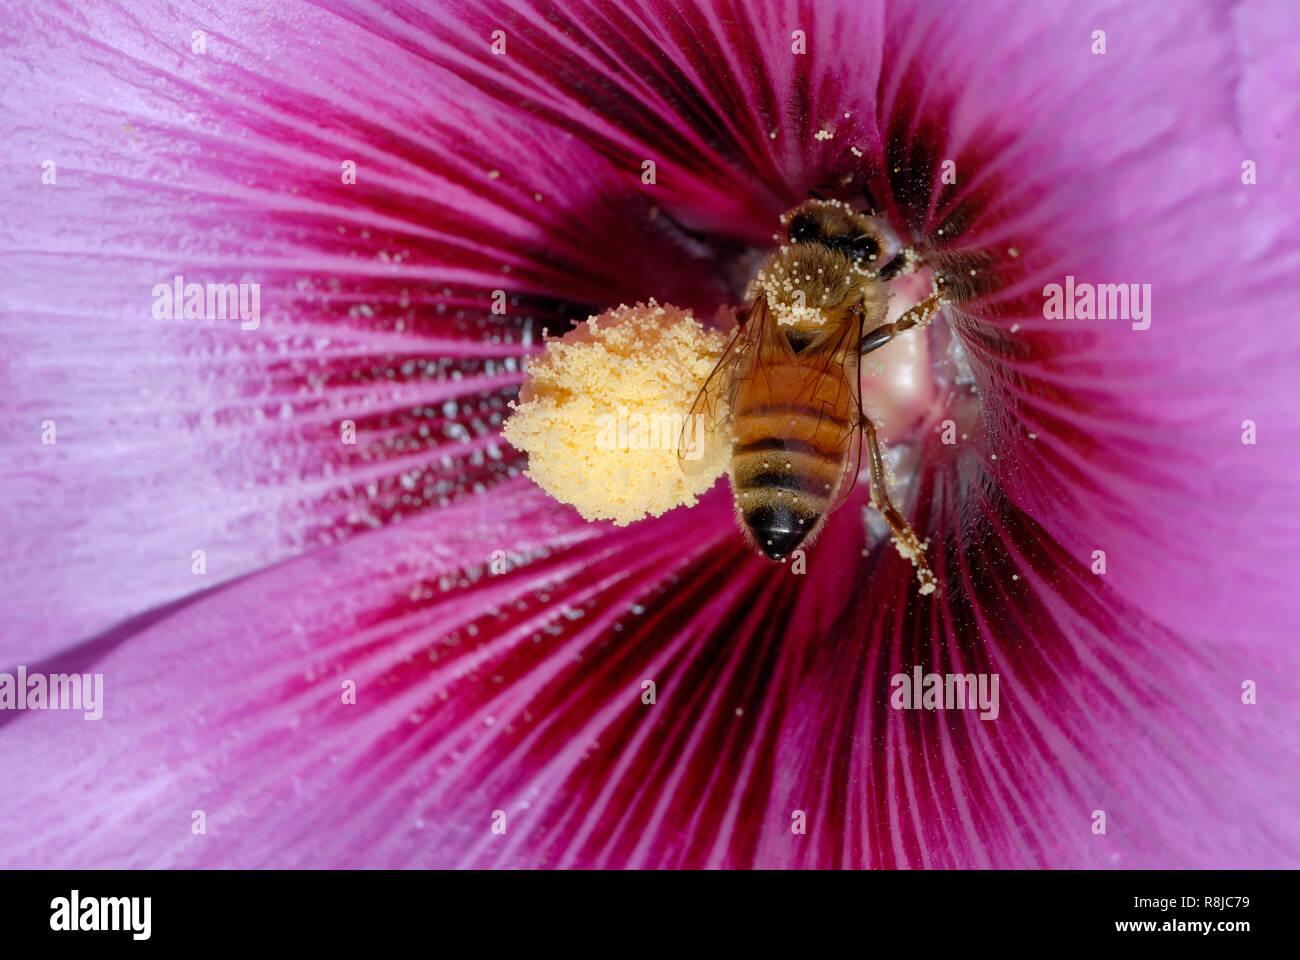 Bee pollinating purple flower - Stock Image